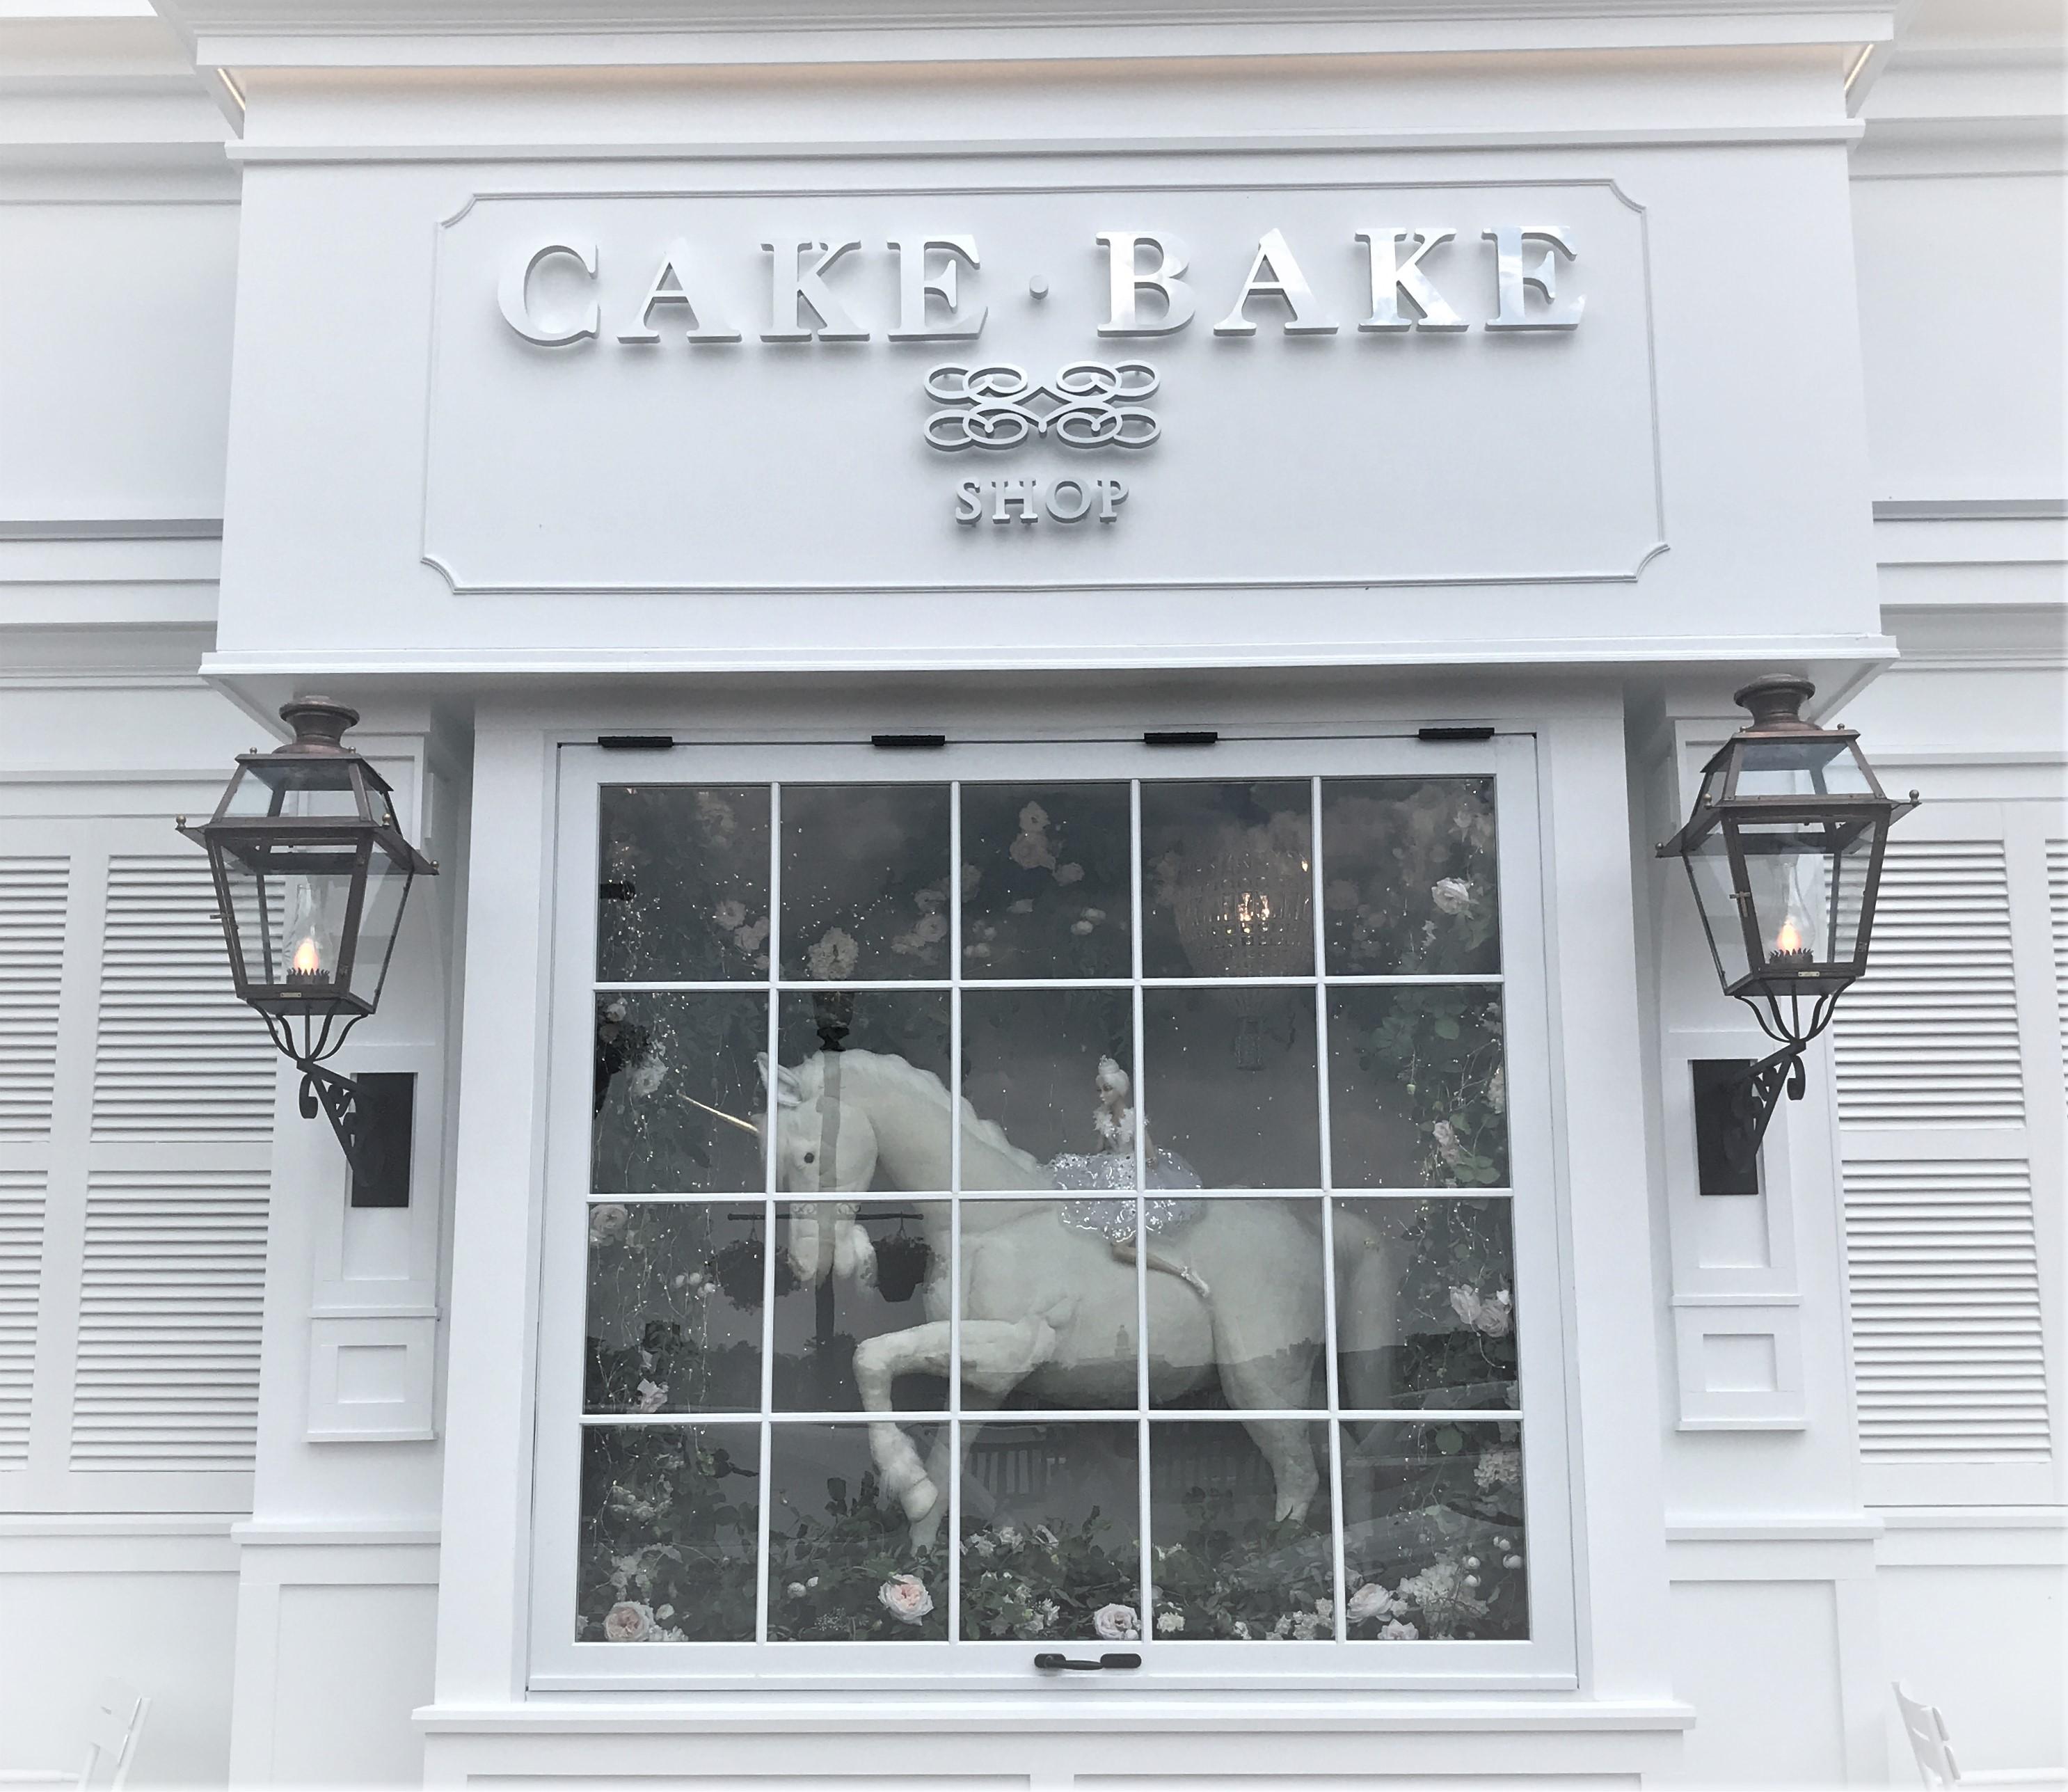 Exterior of Carmel's Cake Bake Shop